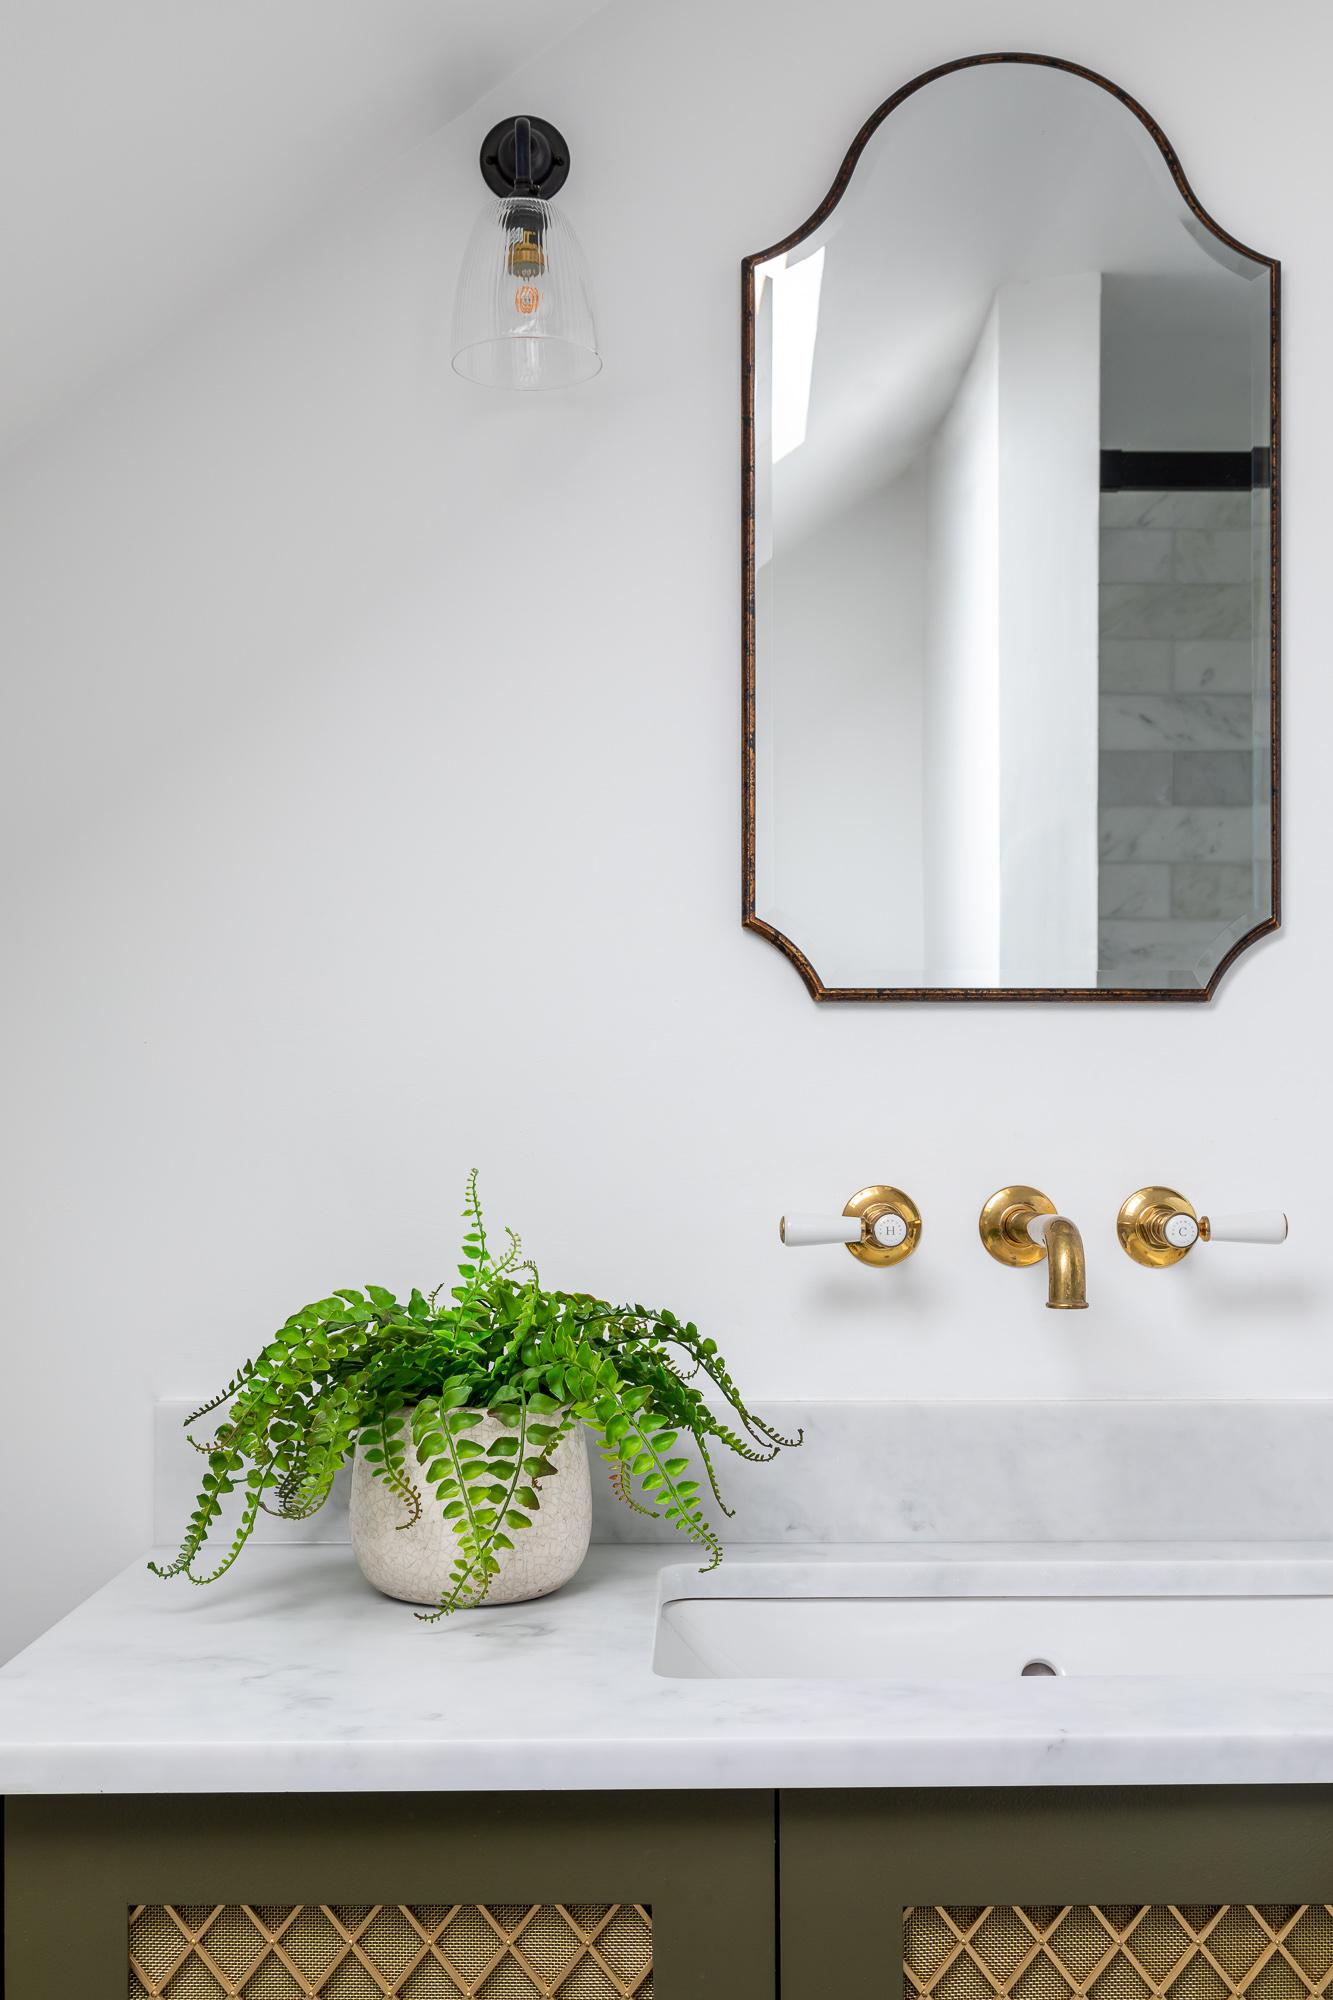 jonathan bond, bathroom wall mirror, clapham, london